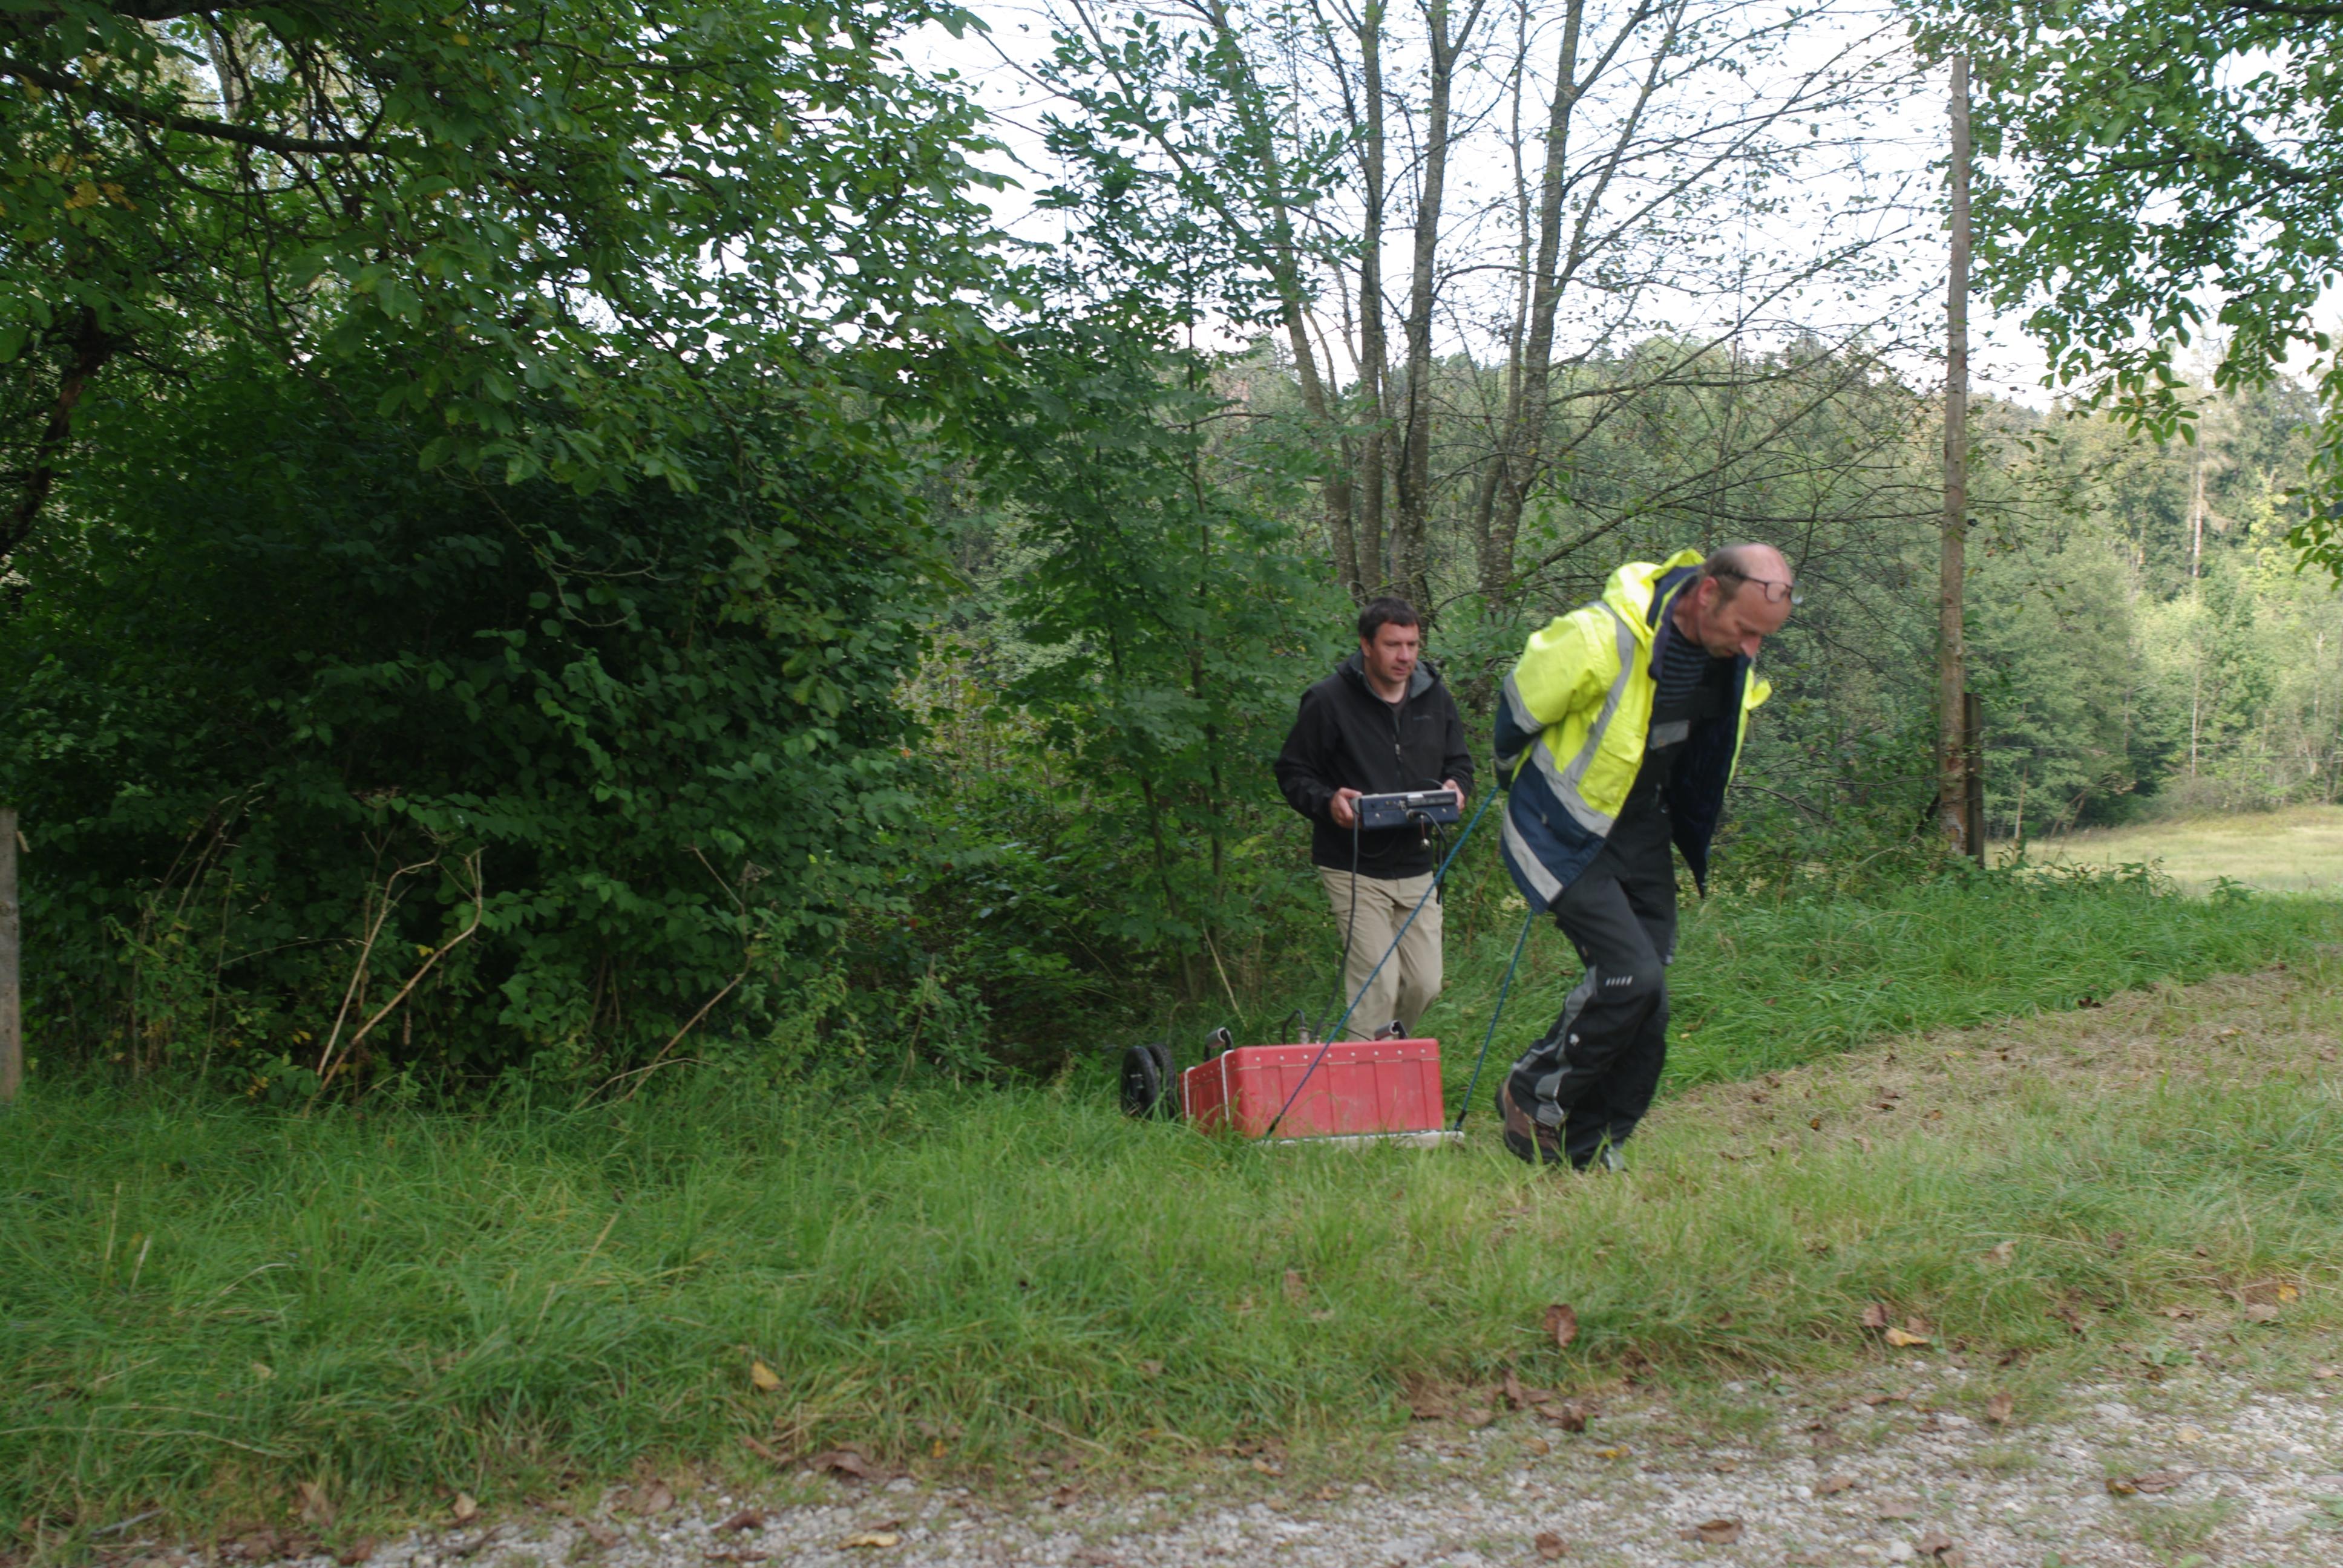 Bodenradar Chiemgau-Impakt 4